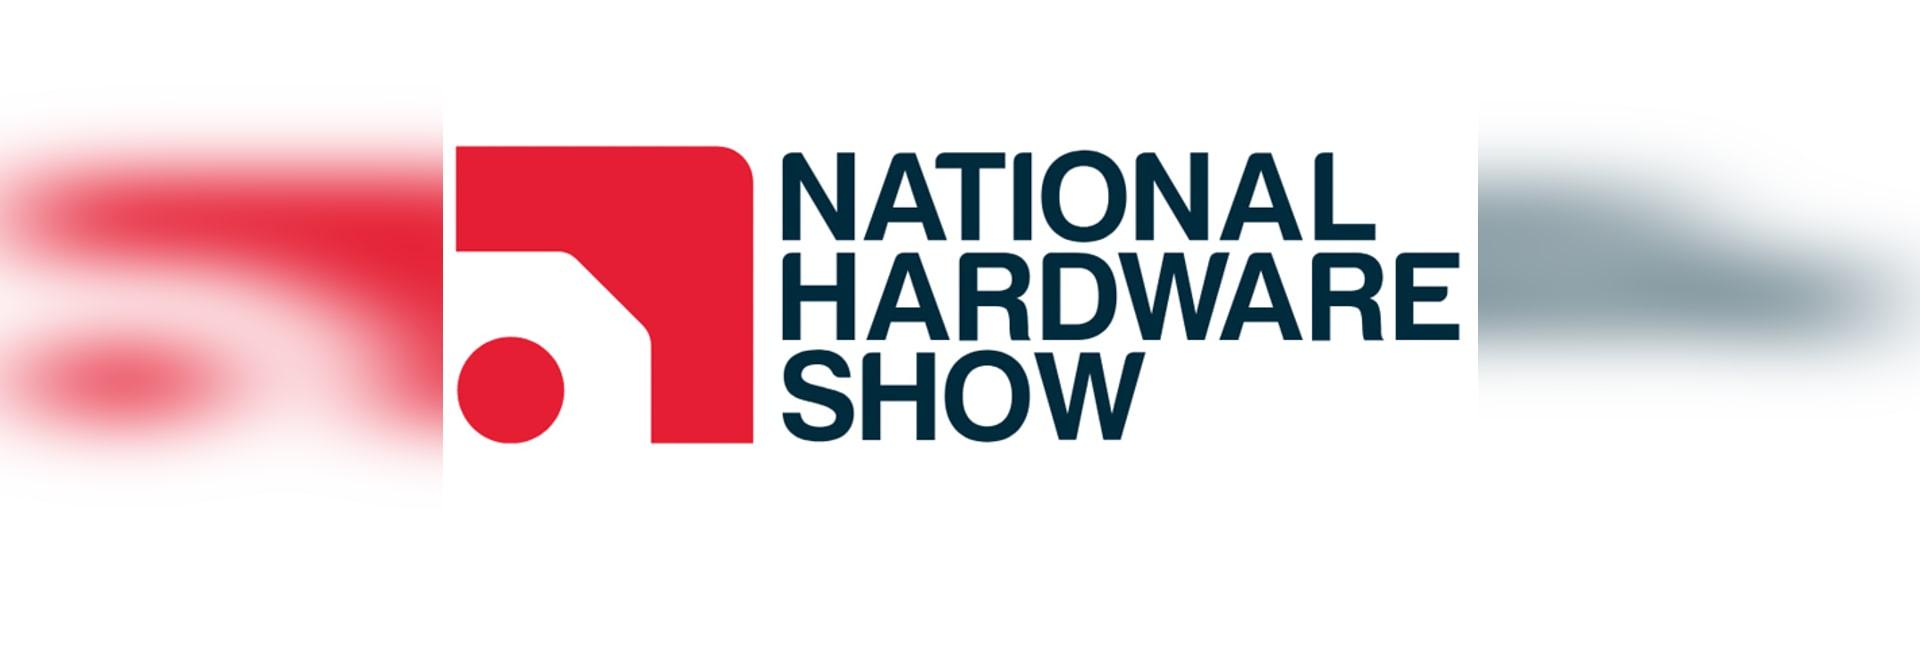 National Hardware Show in Las Vegas USA